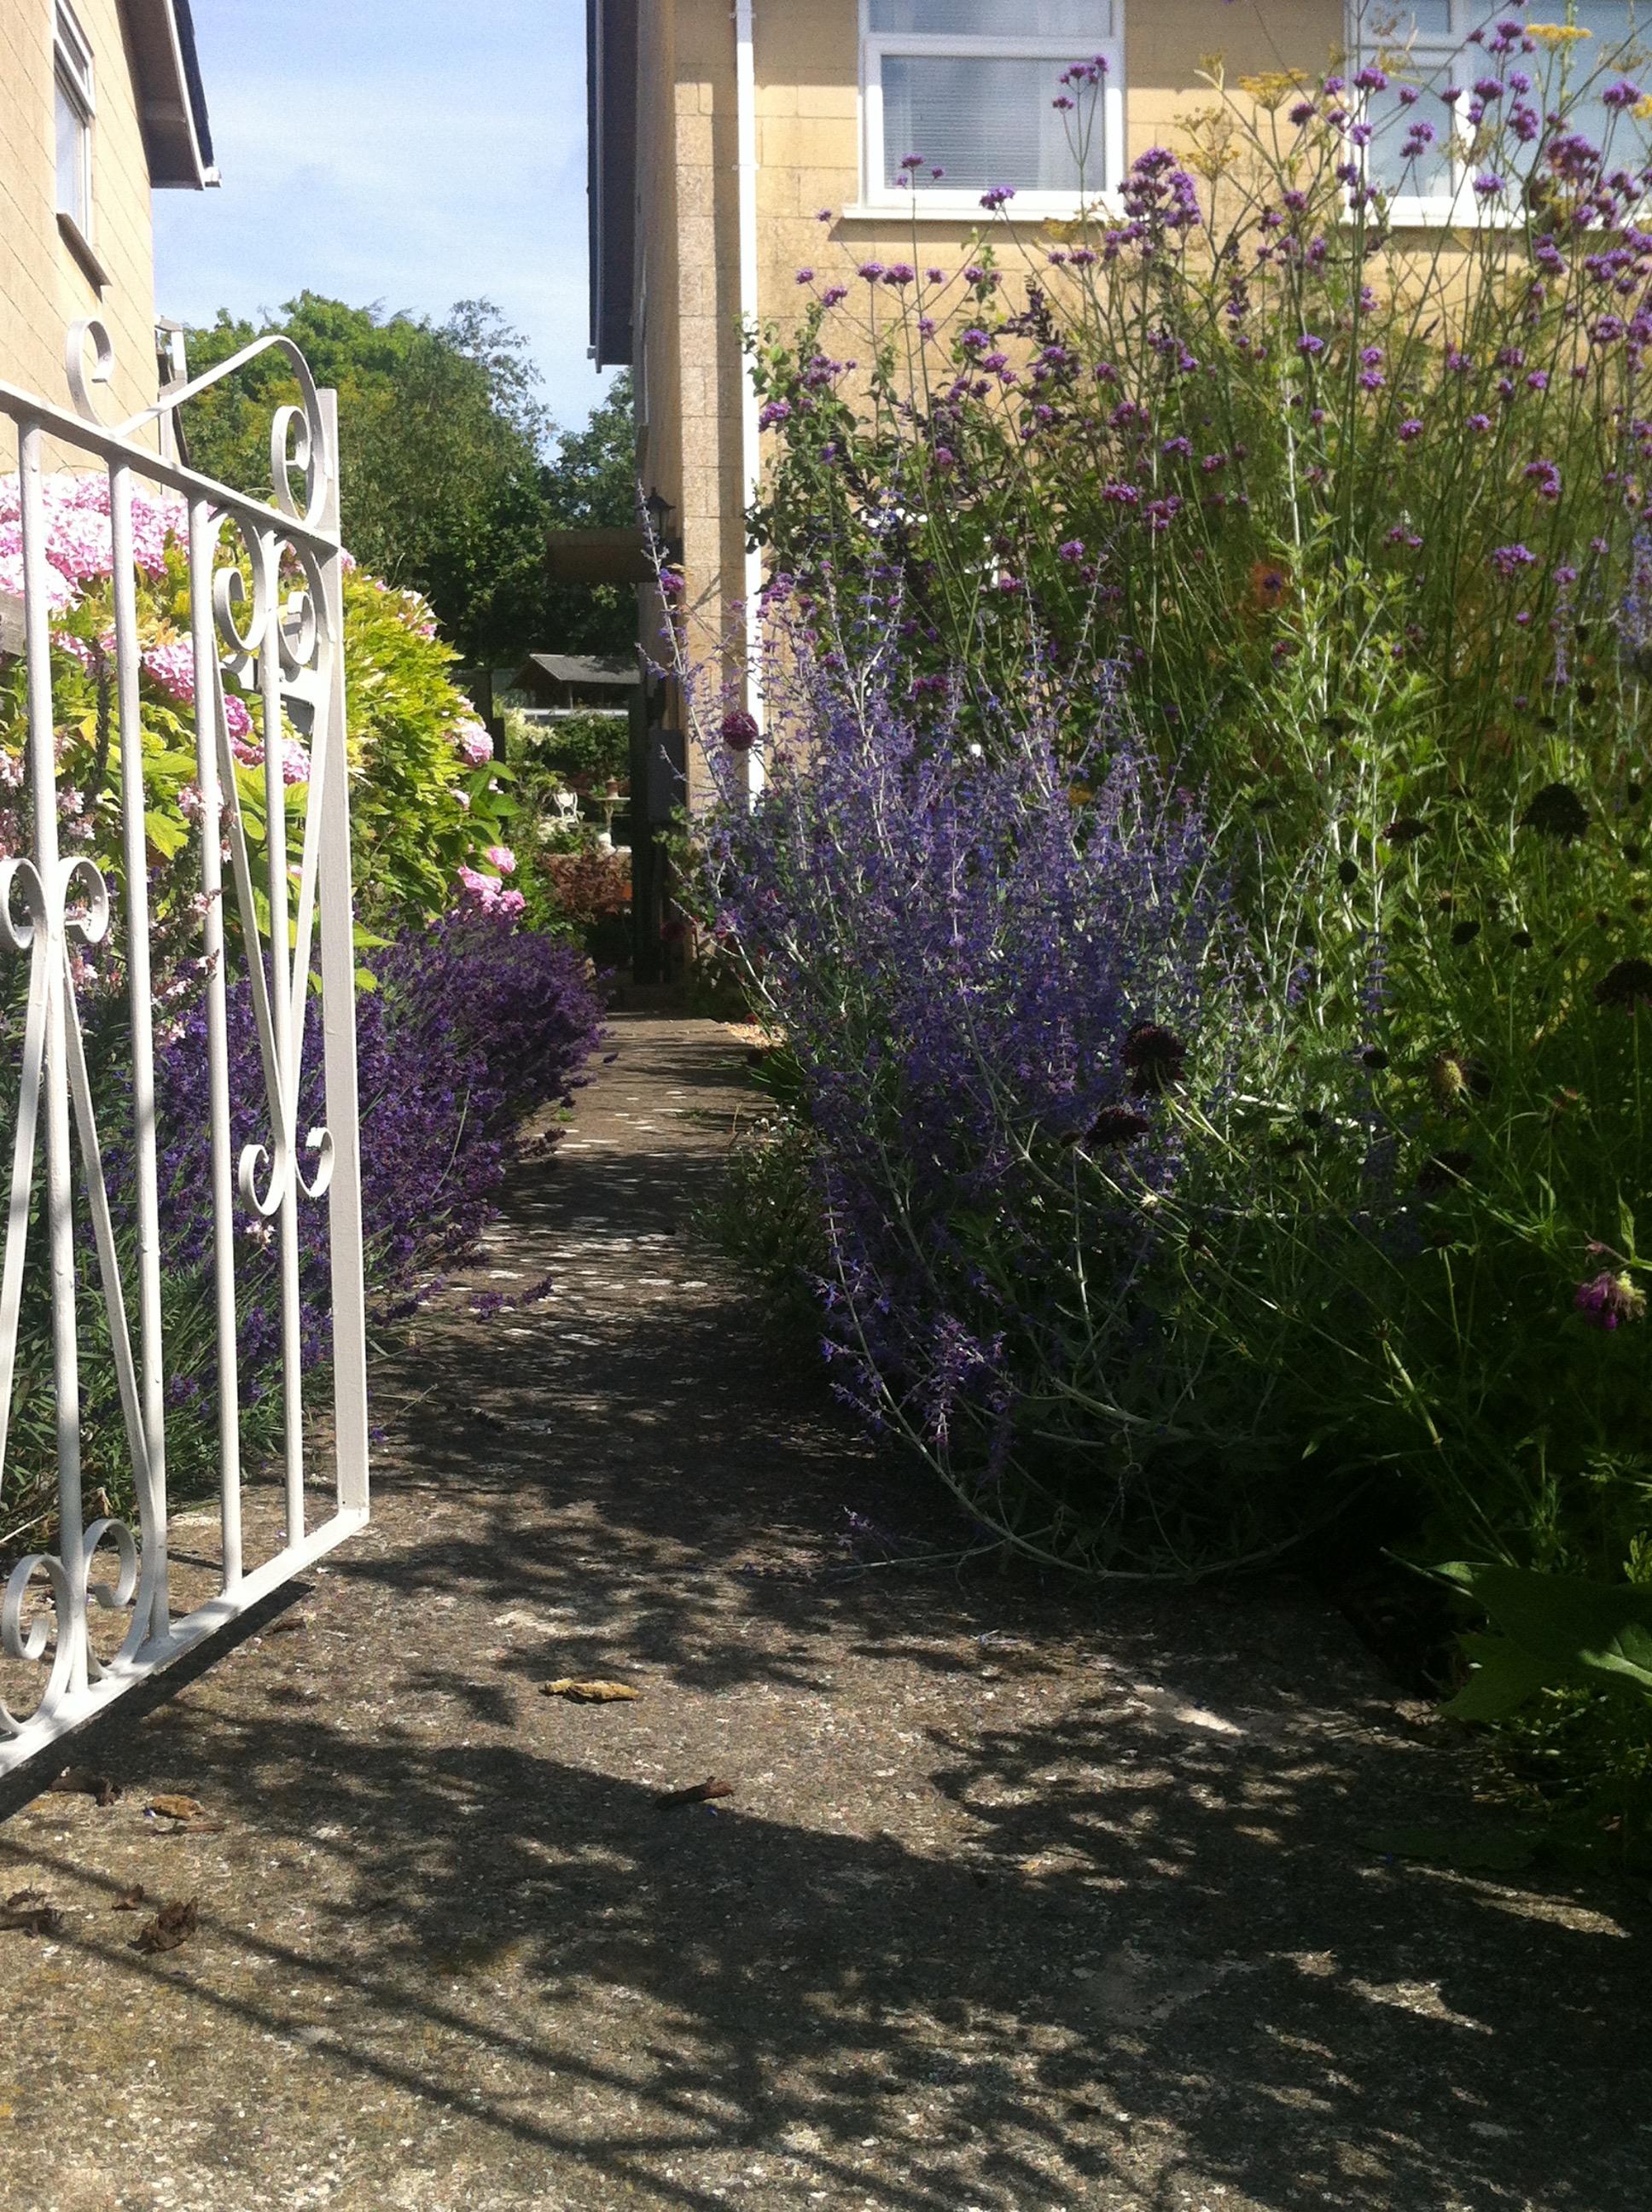 Arch gateway into the garden